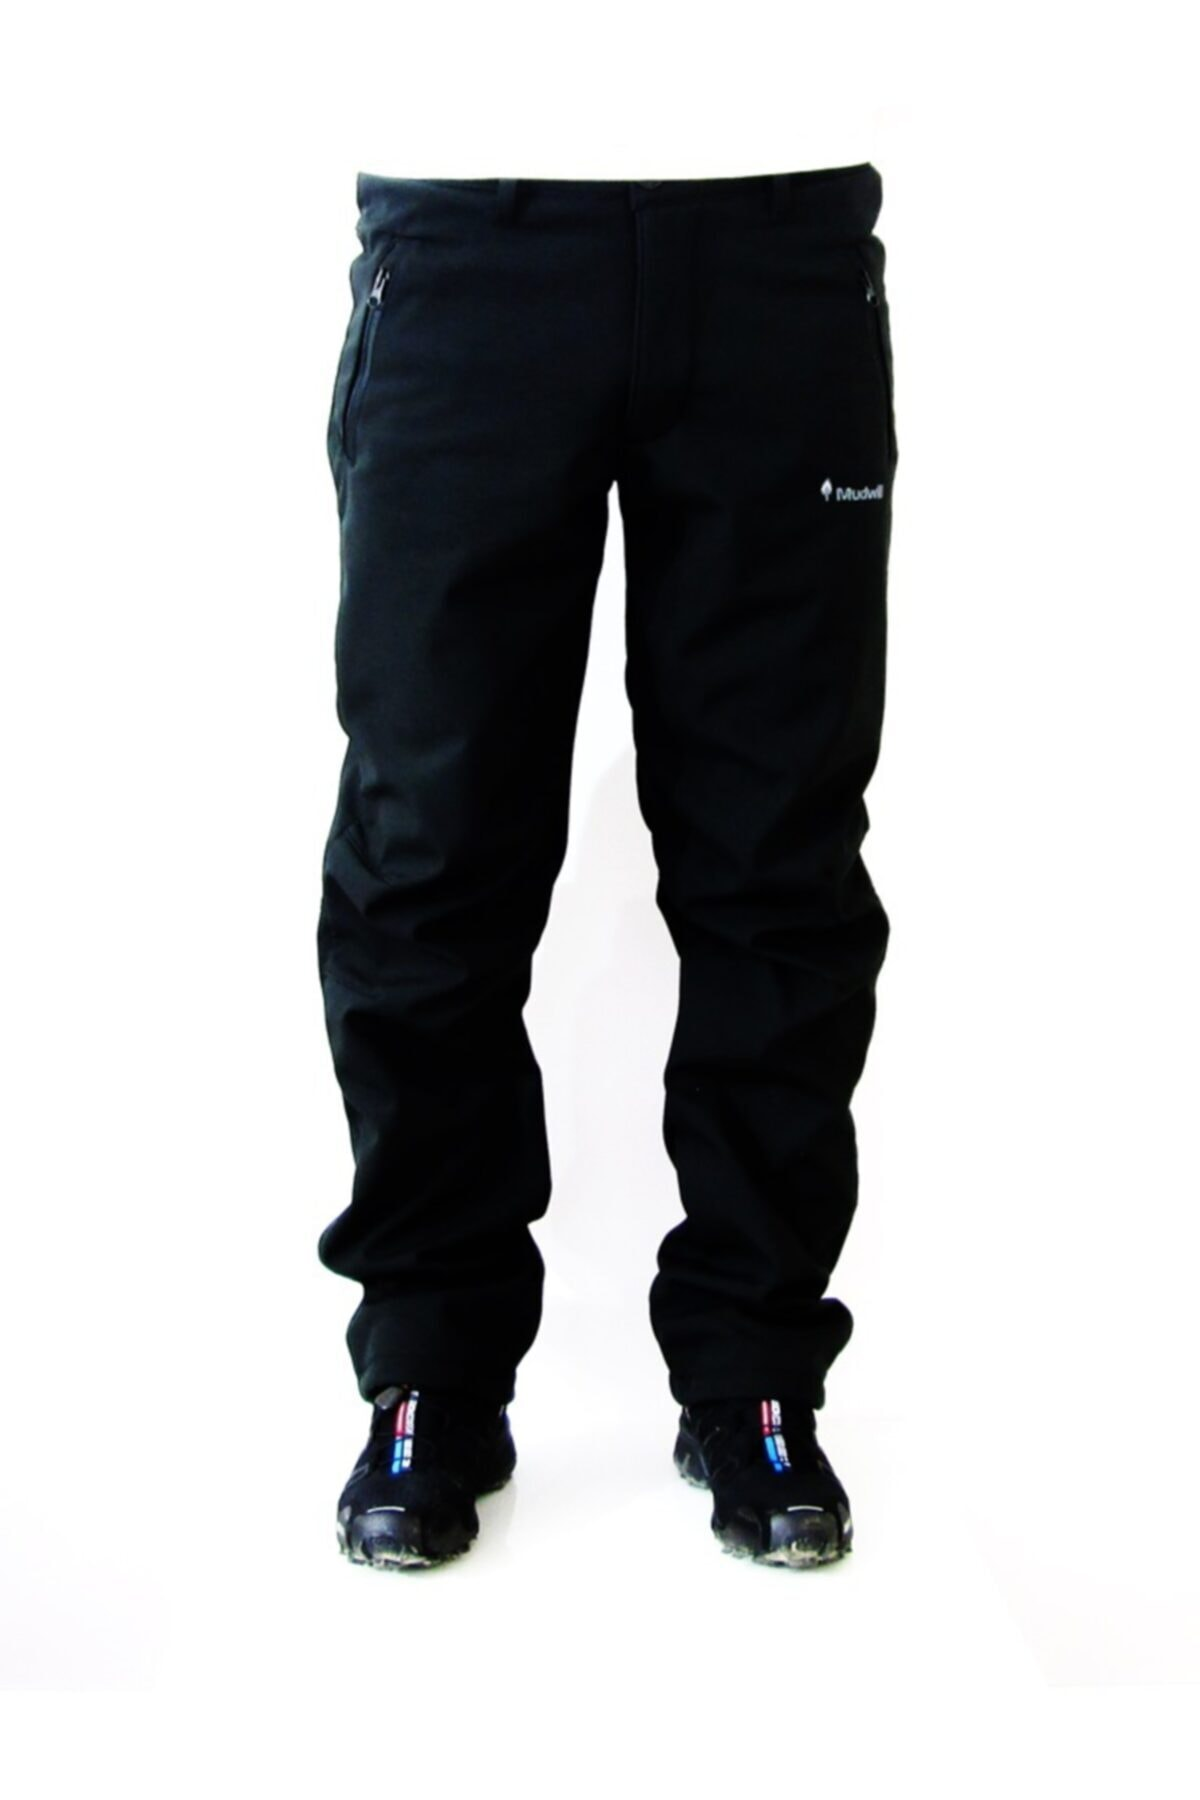 Mudwill Erkek Siyah Outdoor Softshell Pantolon  202223 2